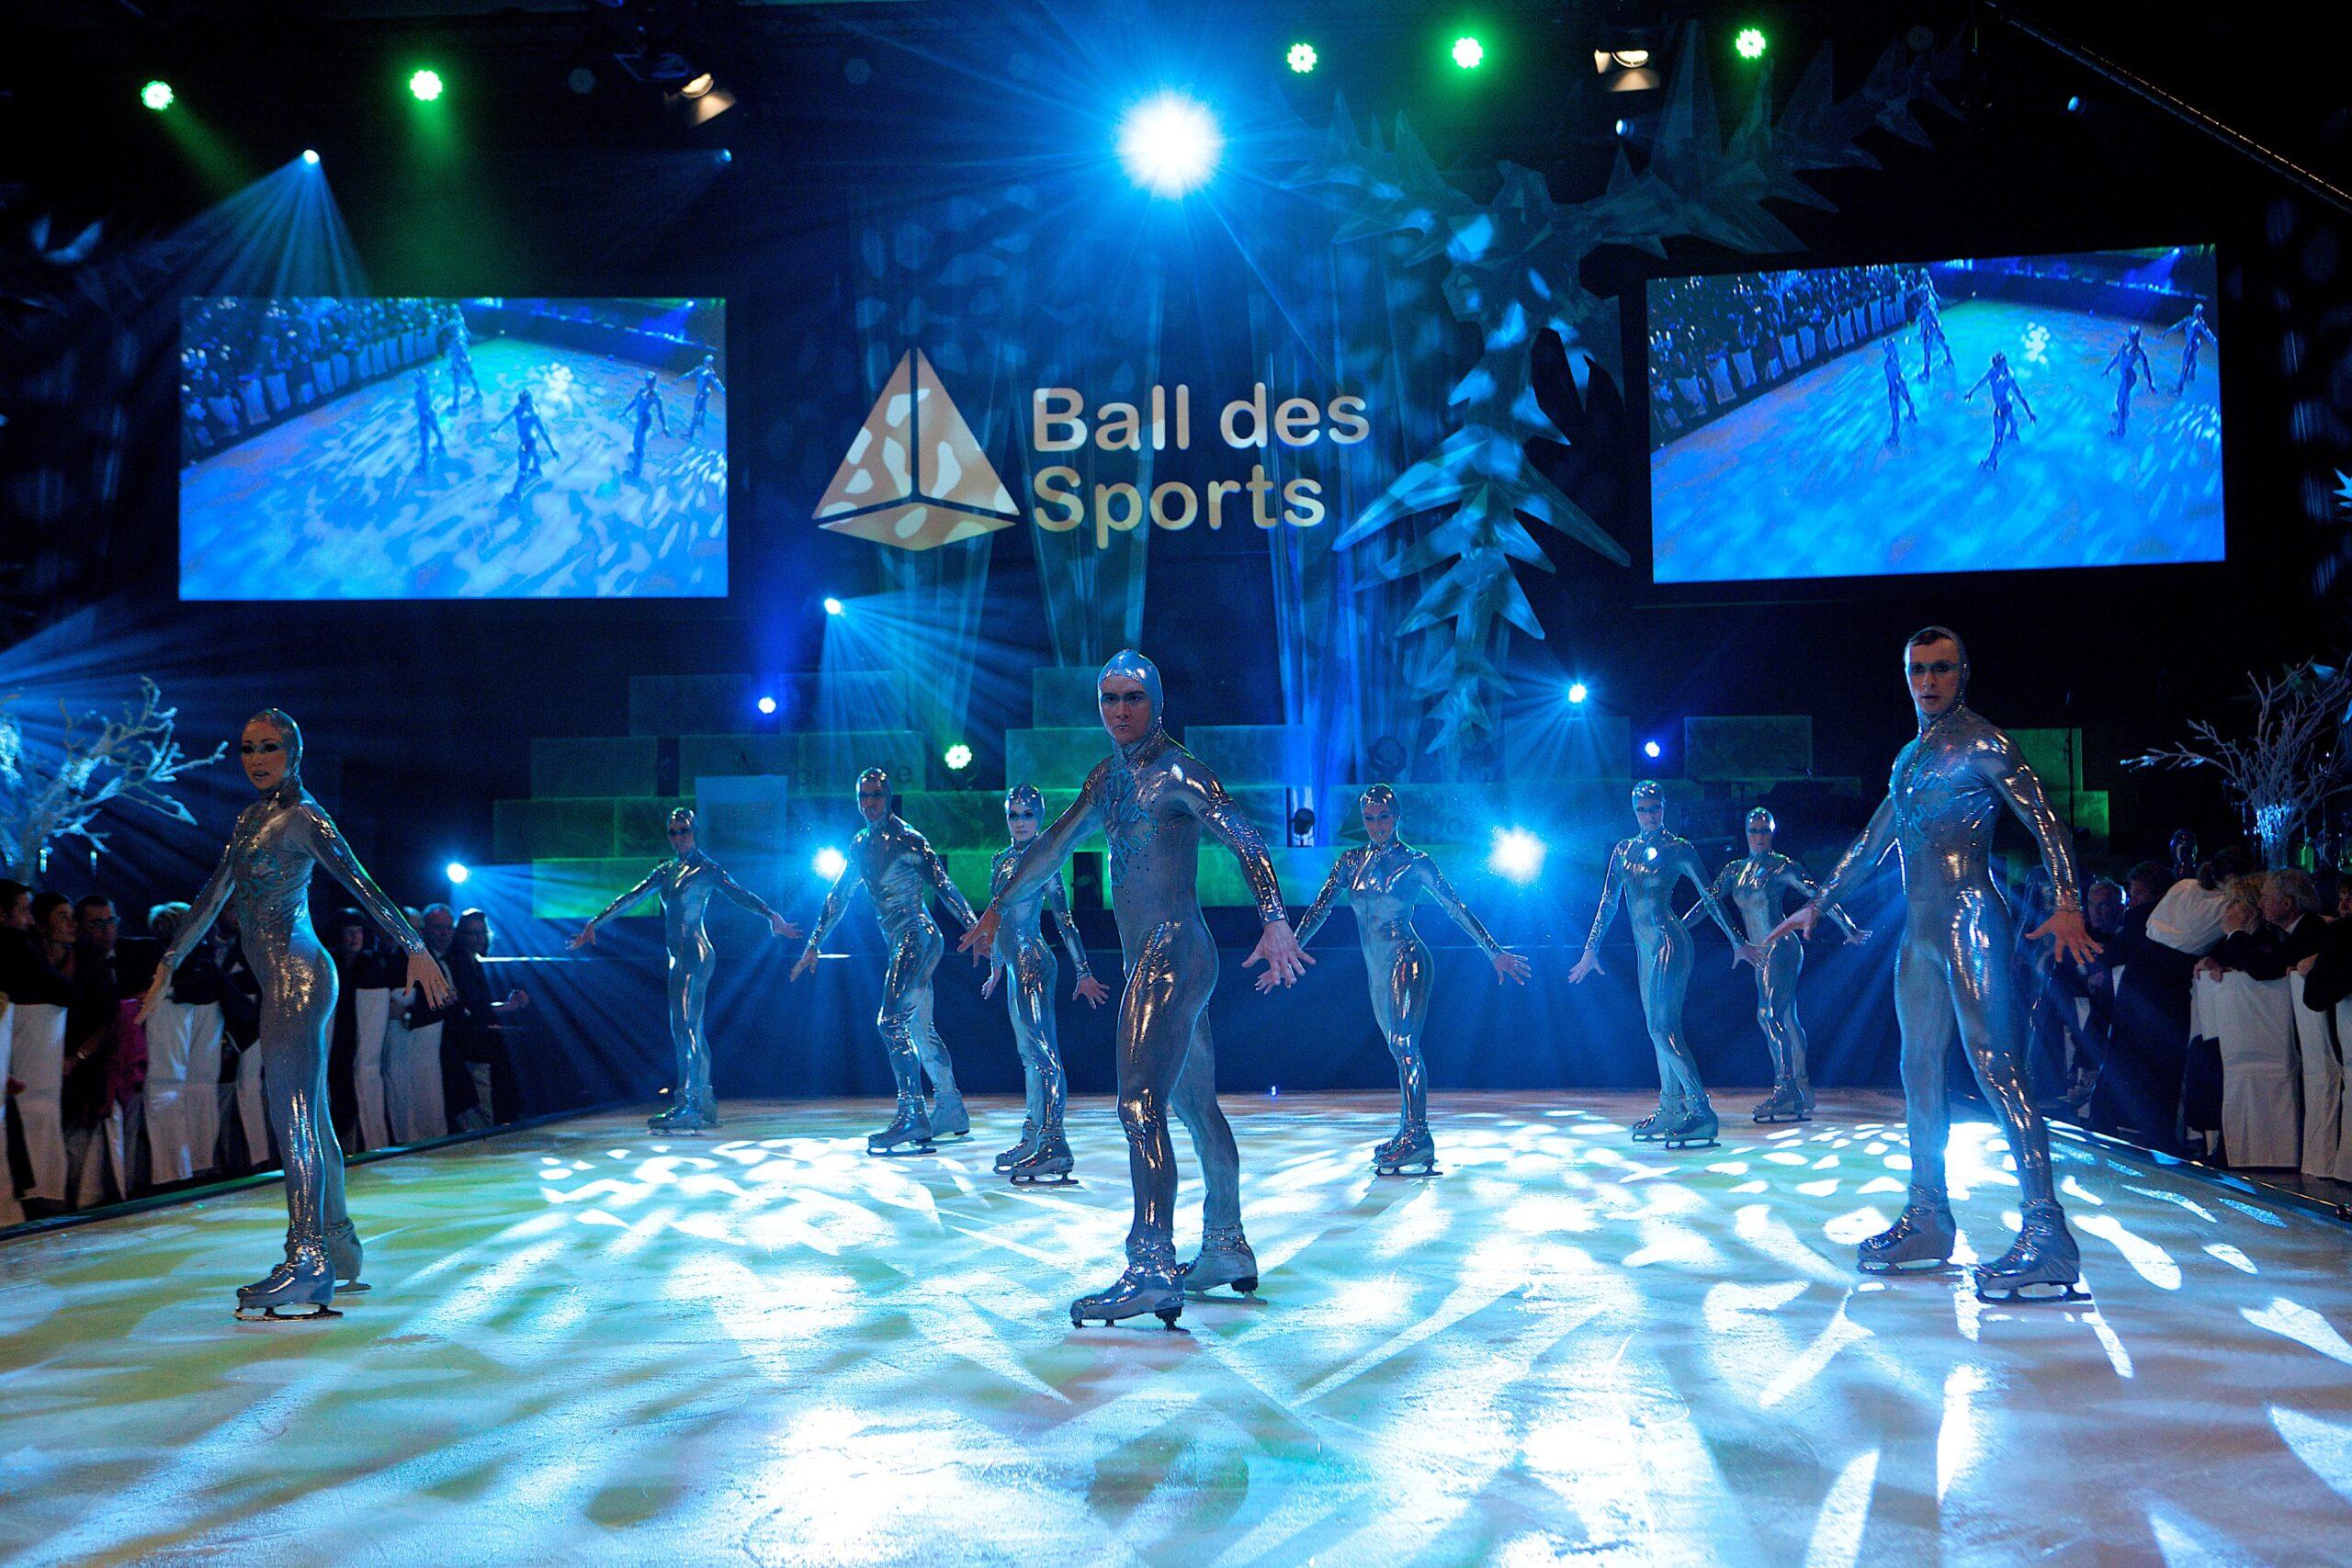 SPOTLIGHT PRODUCTIONS sports & entertainment